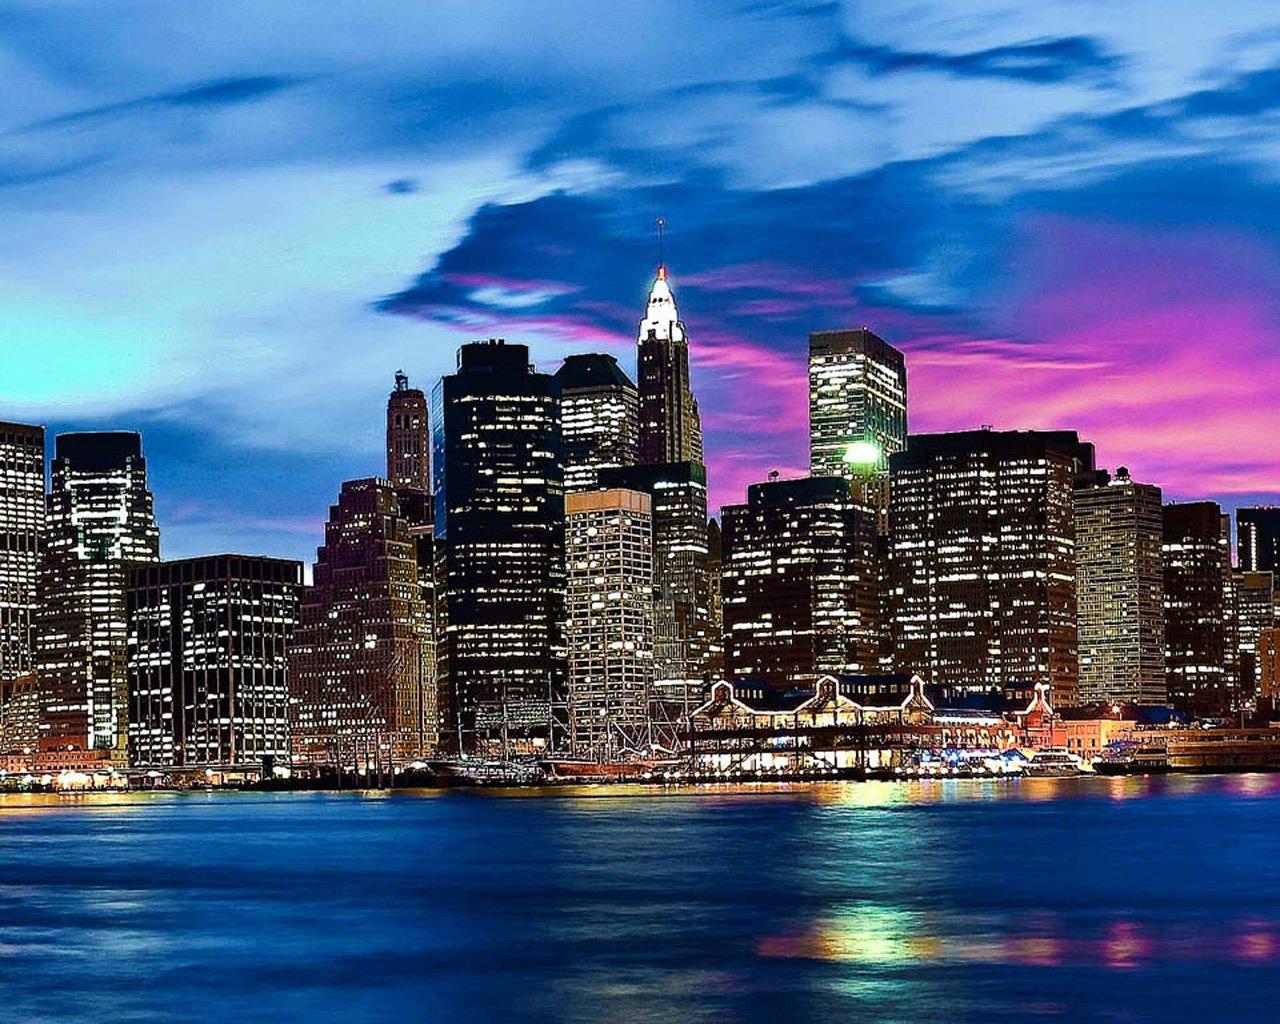 New York Skyline Colors Wallpaper 1280x1024 pixel Popular HD 1280x1024